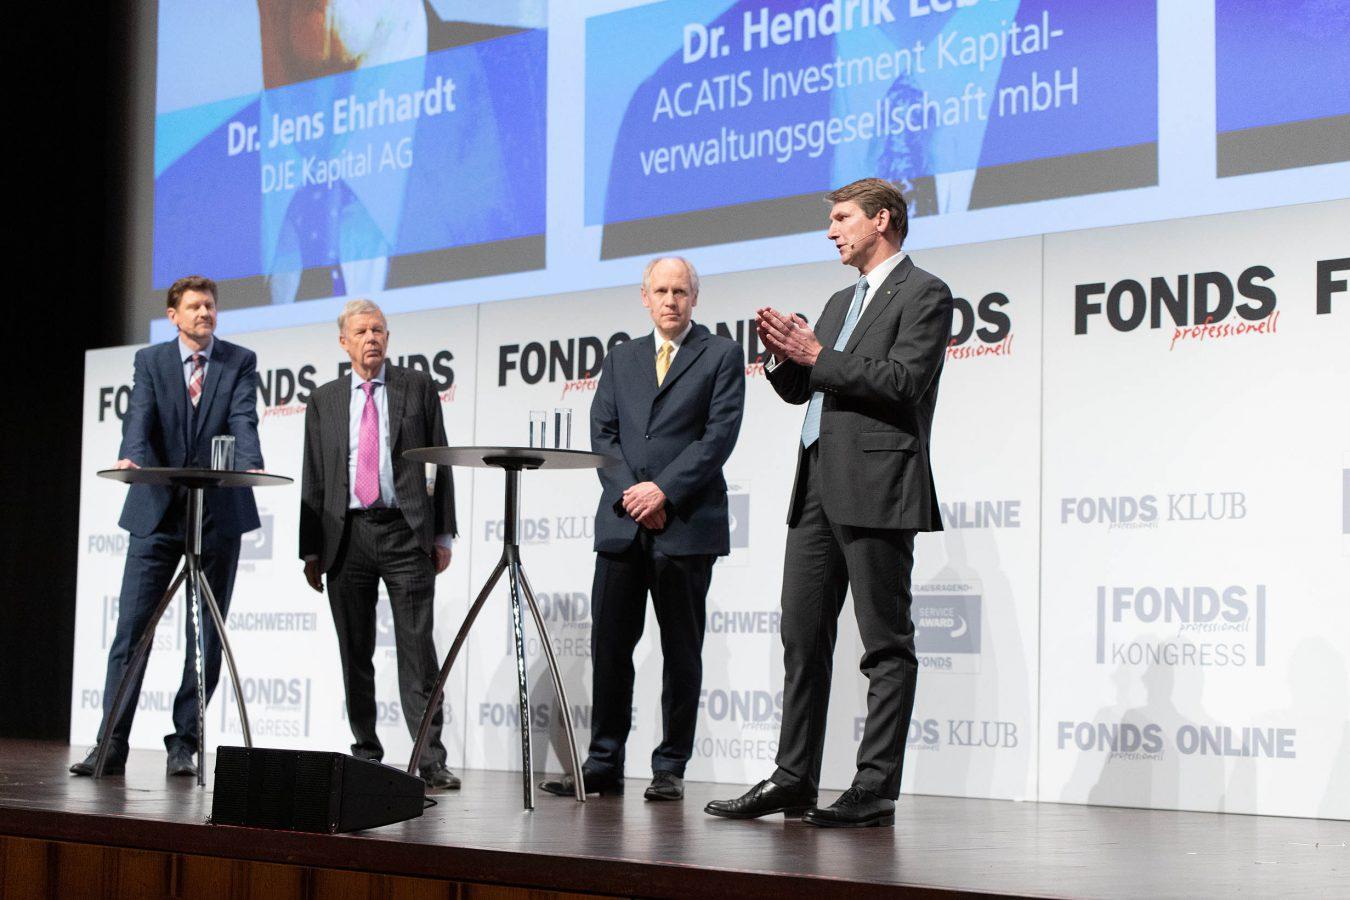 Andreas Grünewald, Hendrik Leber, Jens Ehrhardt, Kongress, Vortrag, Mannheim, Event, VuV